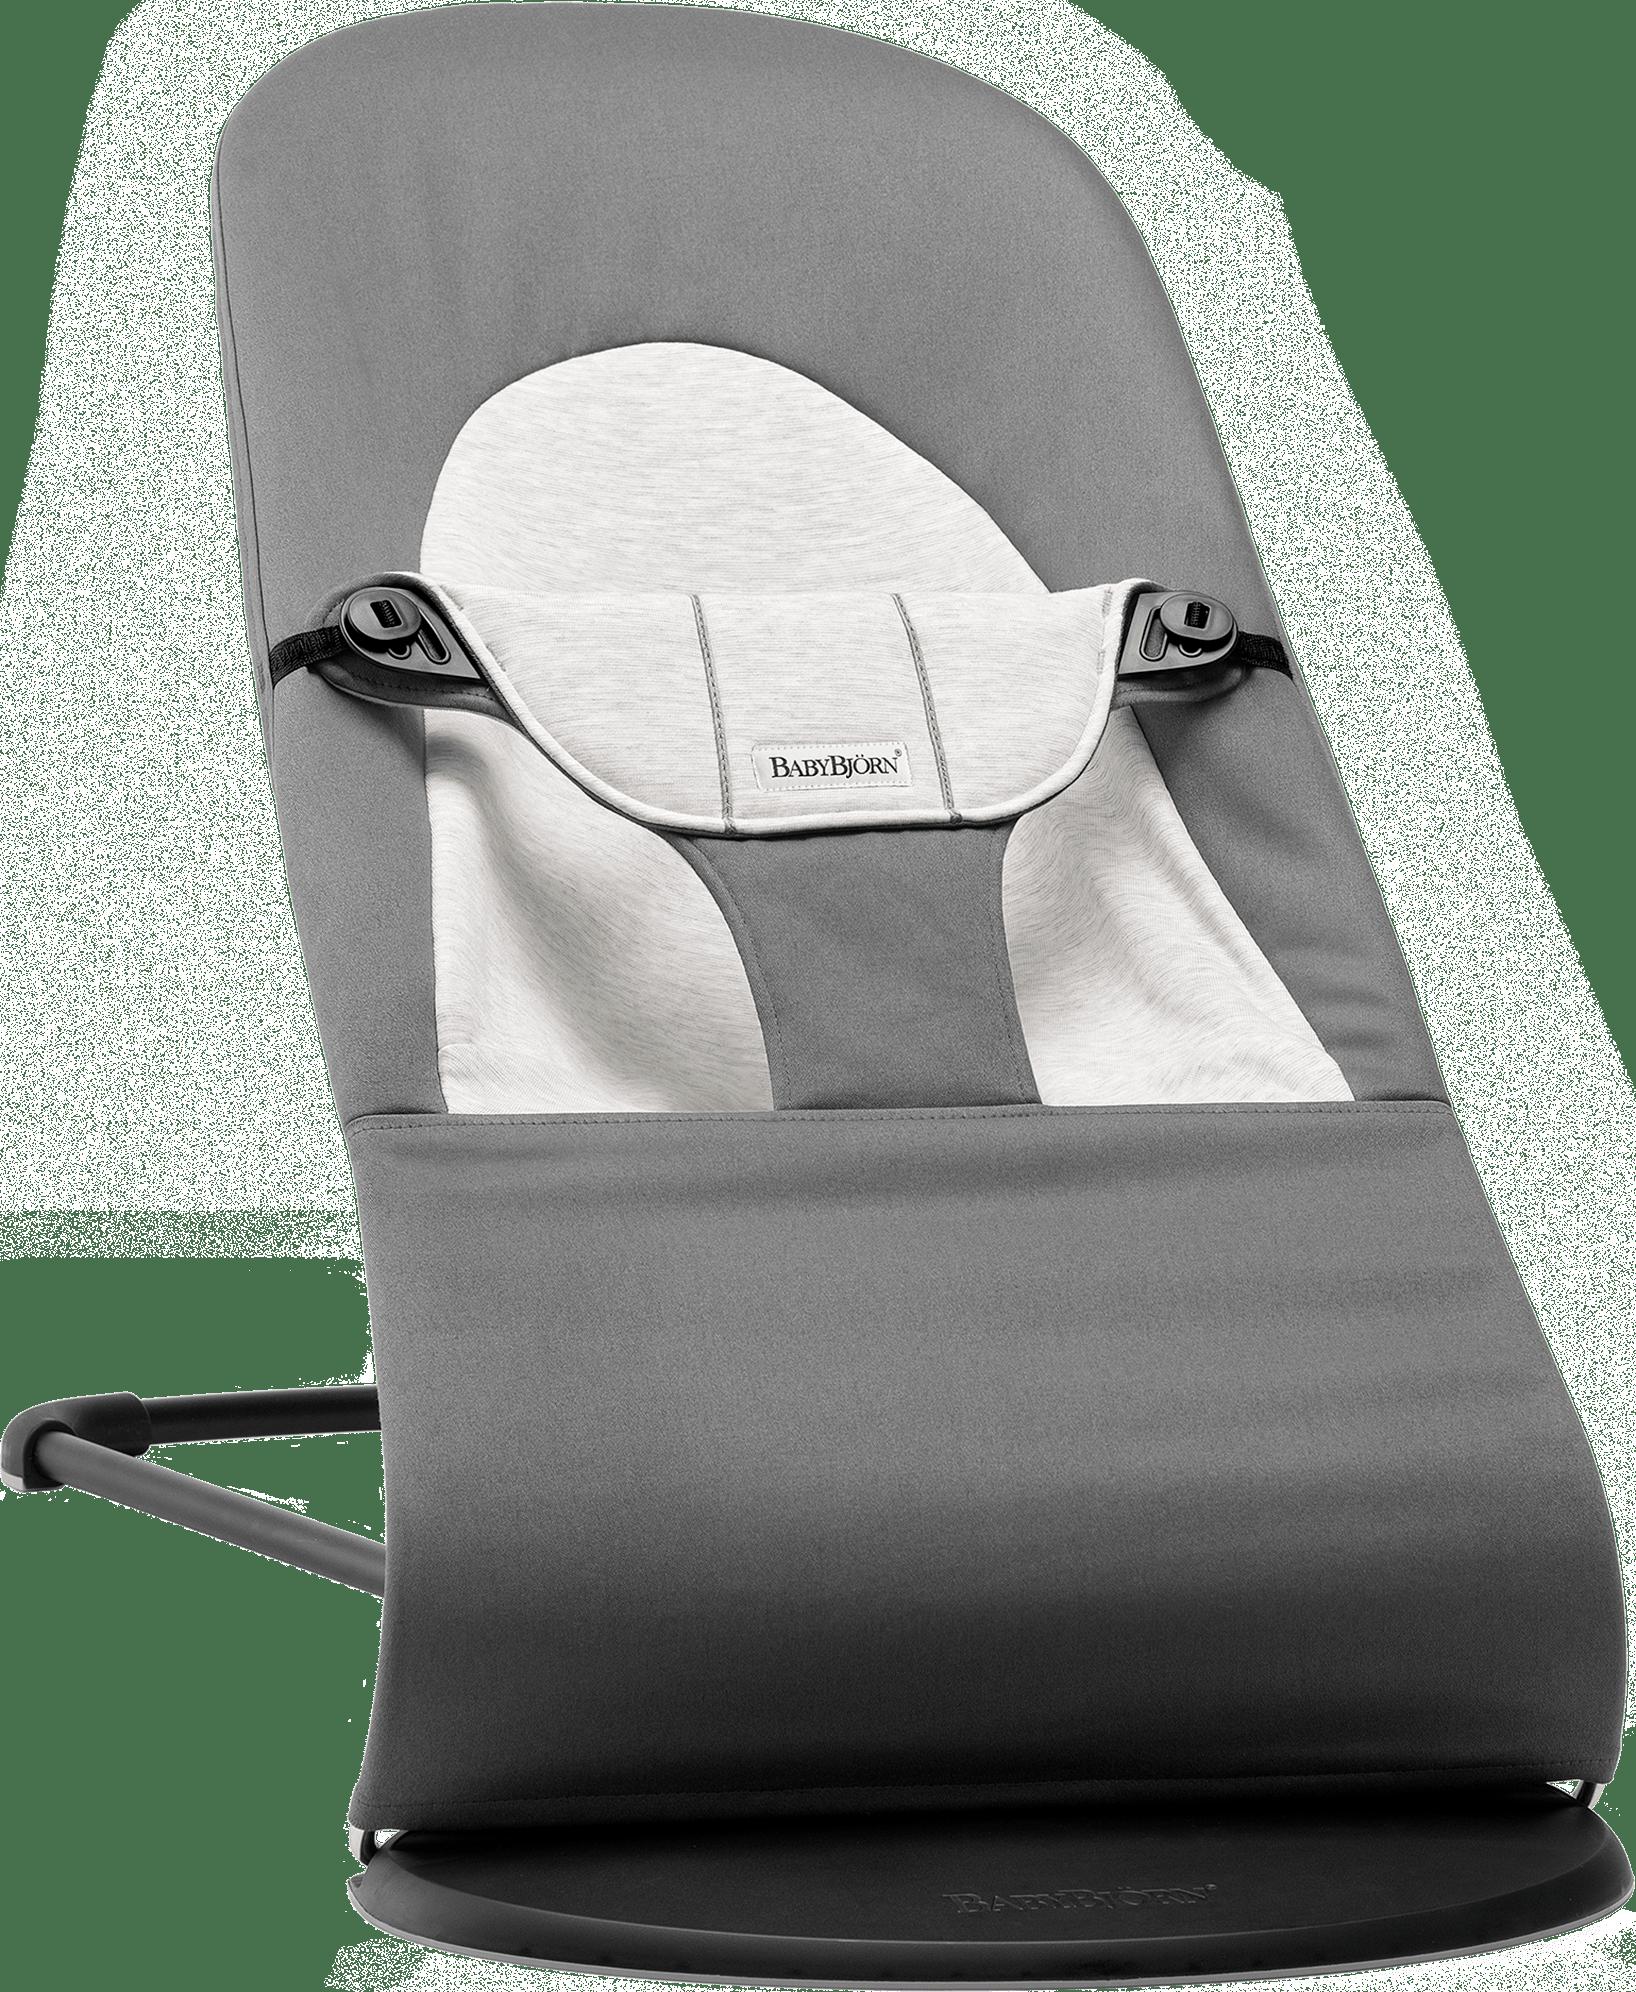 sdraietta-balance-soft-grigio-babybjorn